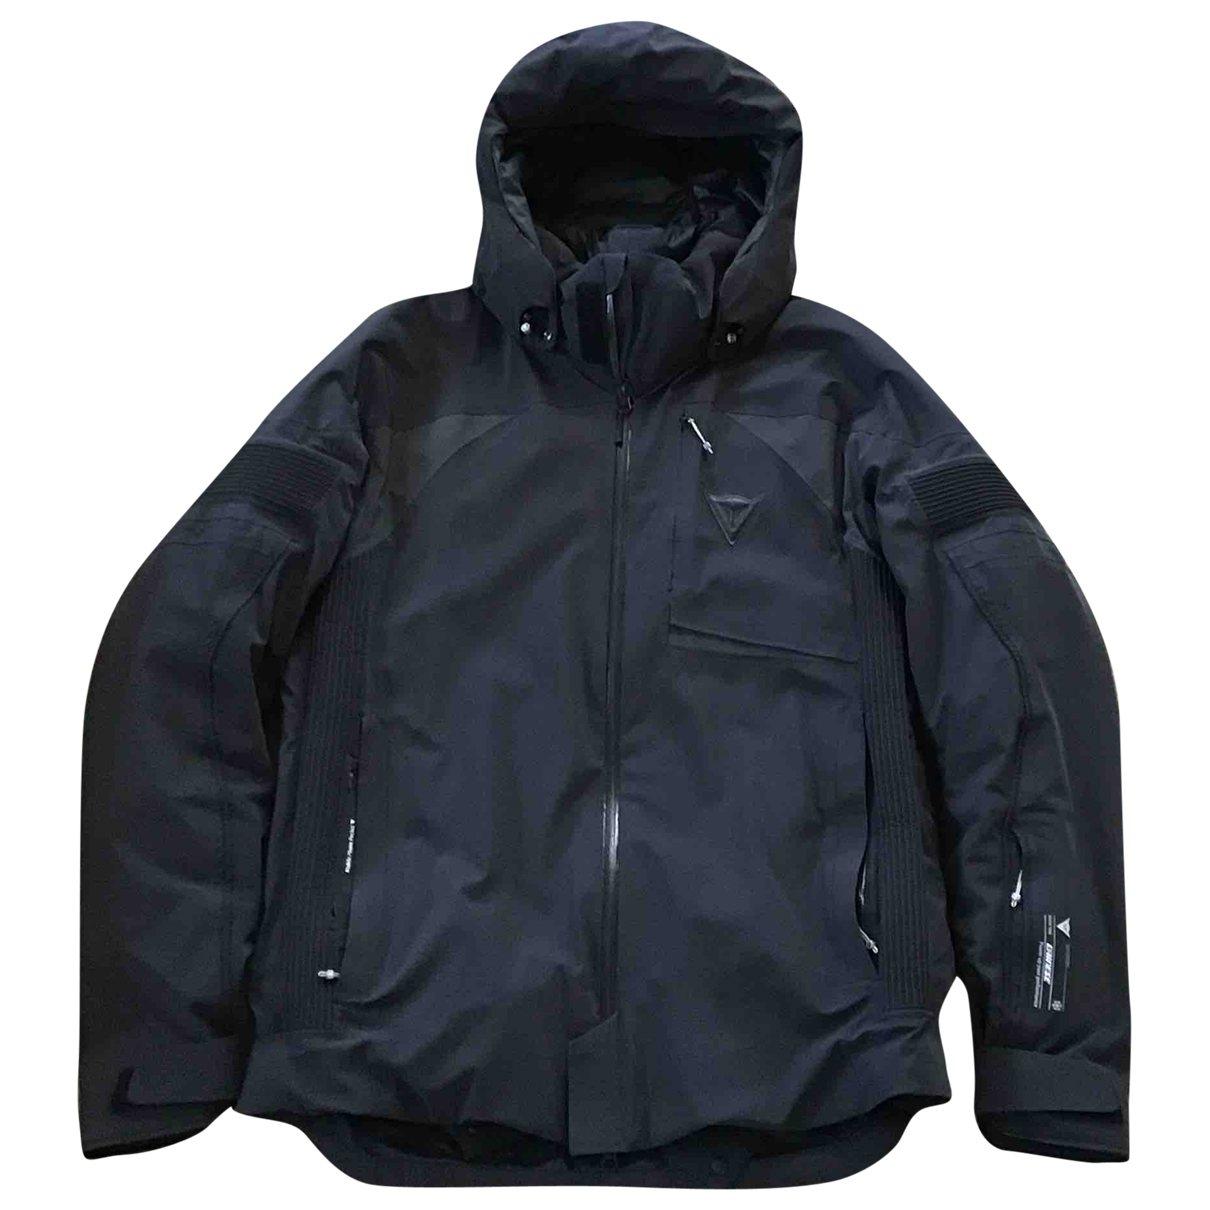 Dainese \N Black jacket  for Men XL International